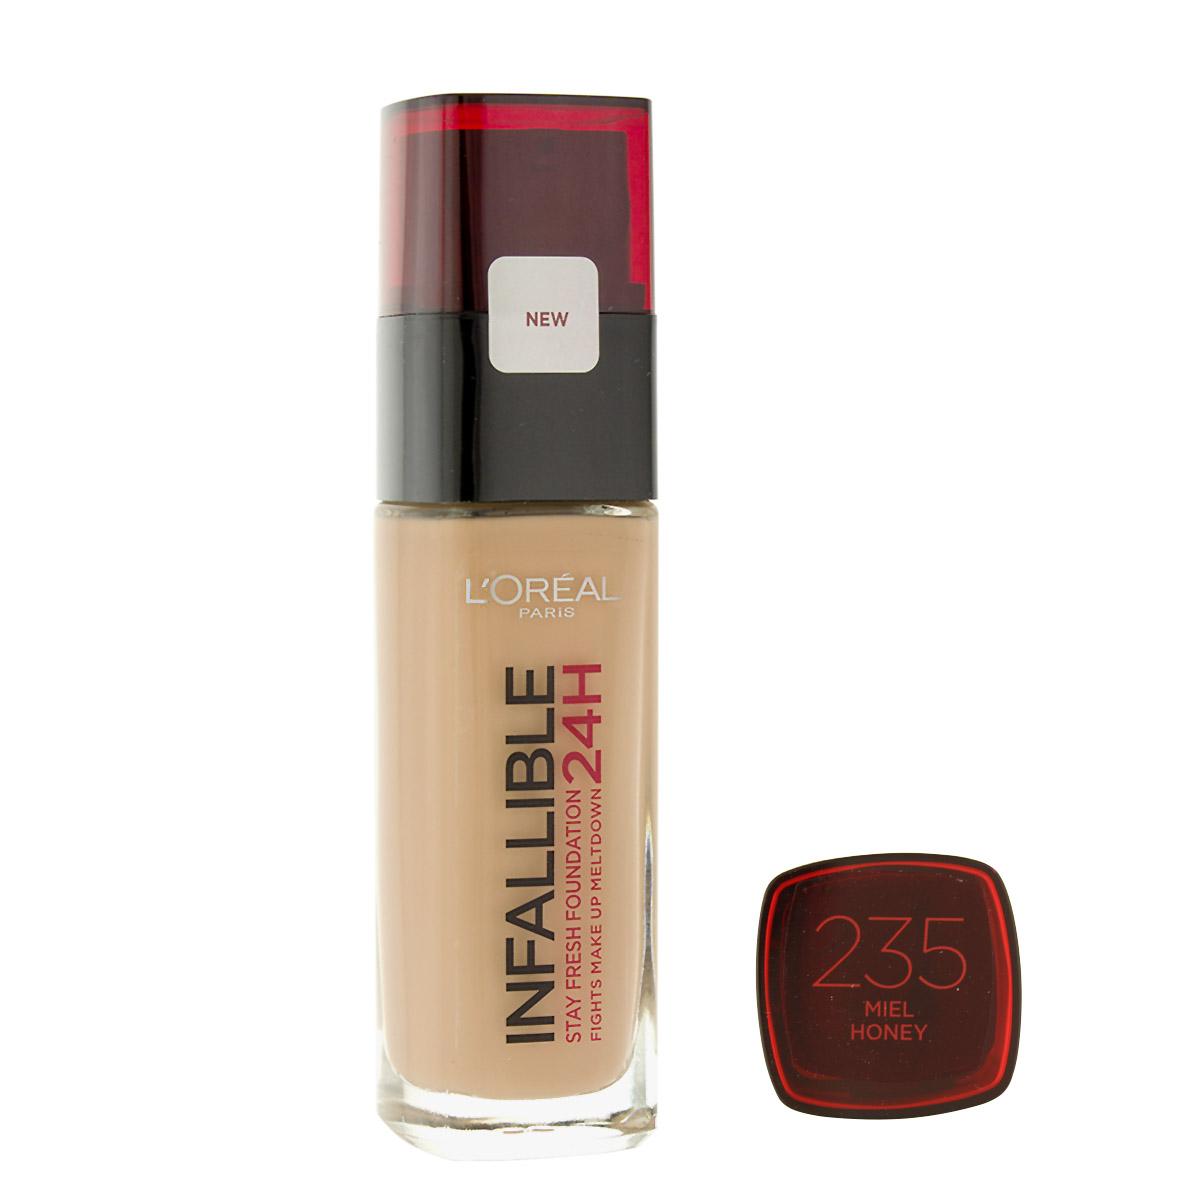 L´Oreal Paris Infallible 24H make-up (235 Honey) 30 ml